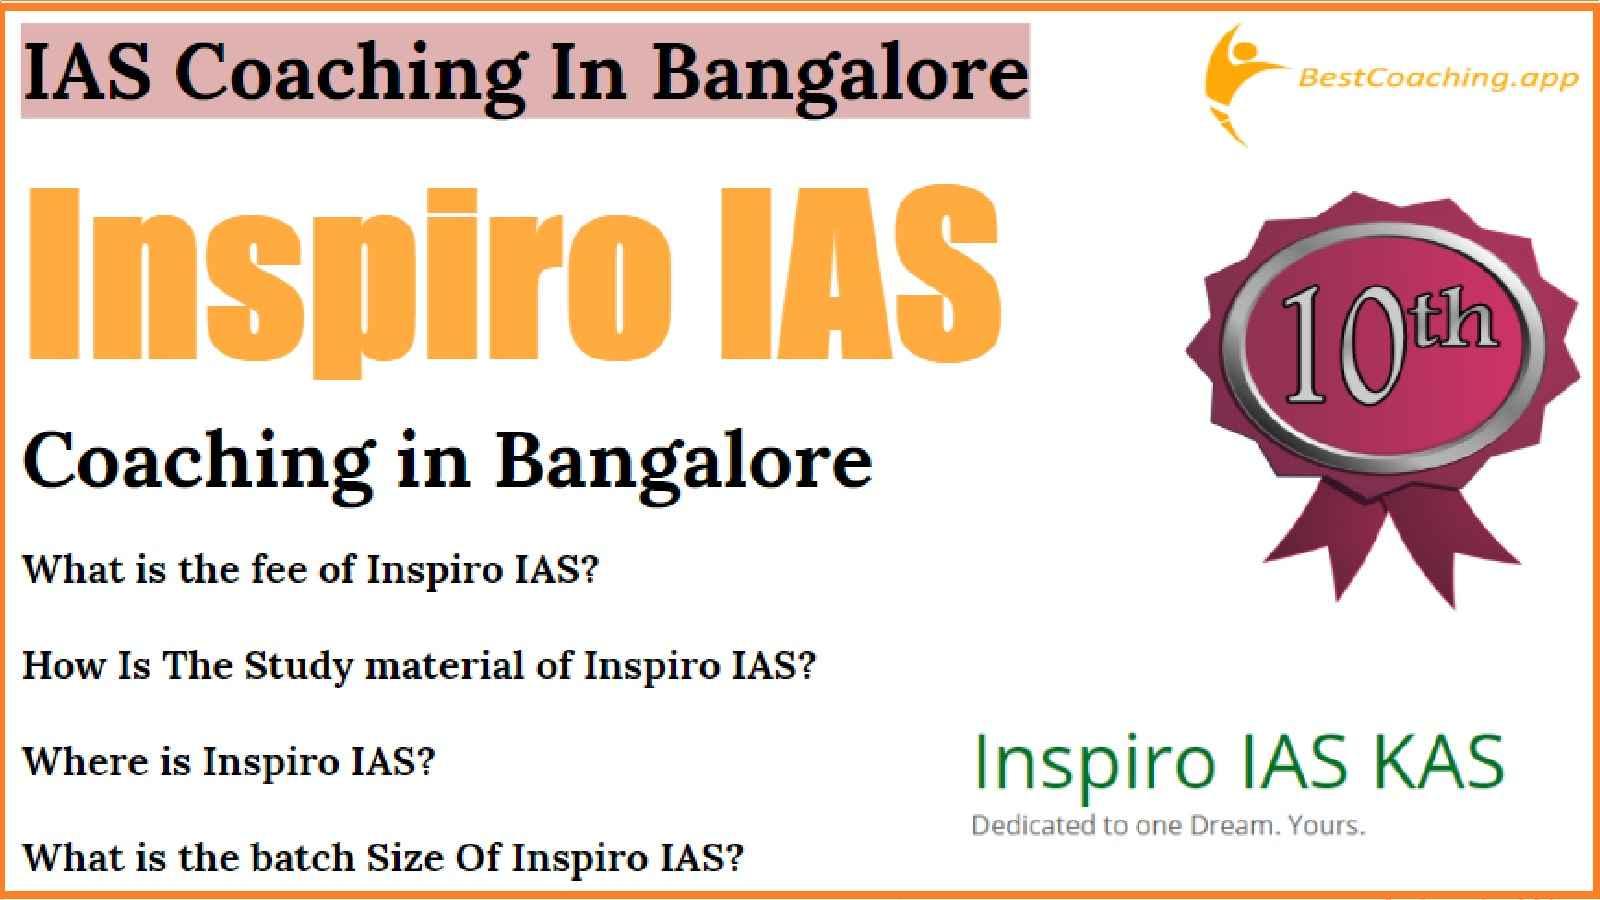 UPSC Coaching Bangalore